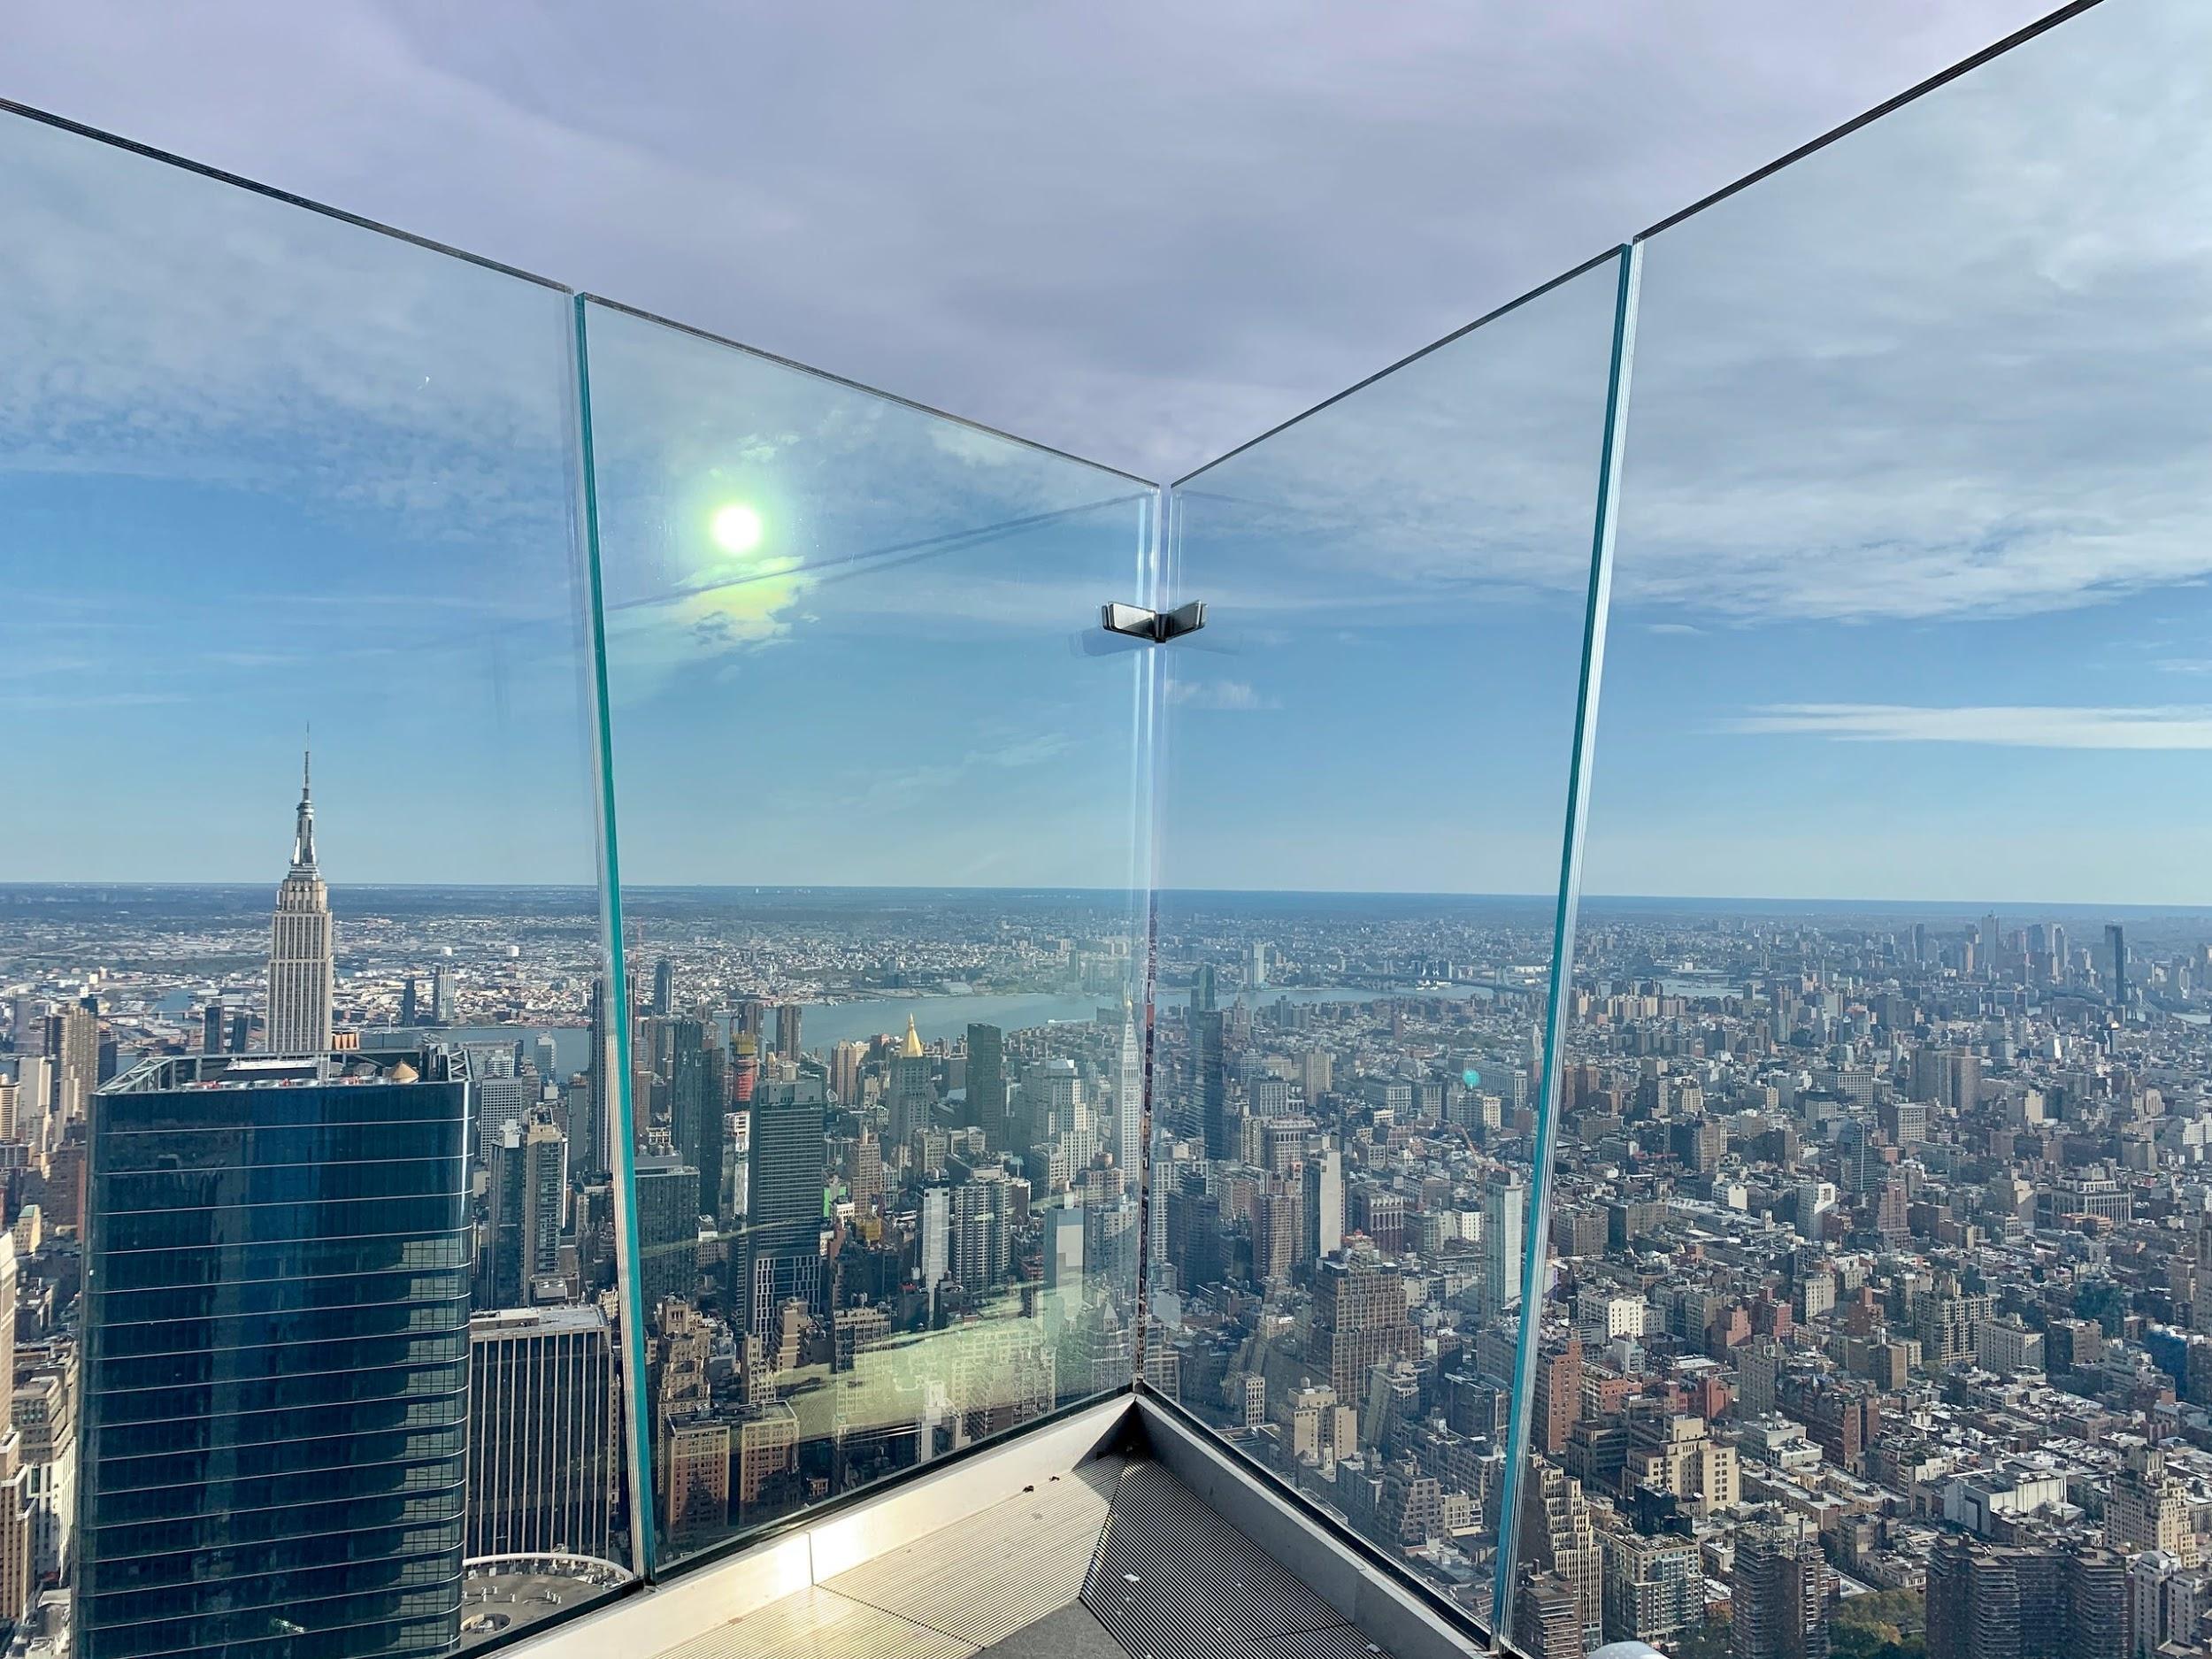 Virtual Tour of New York City